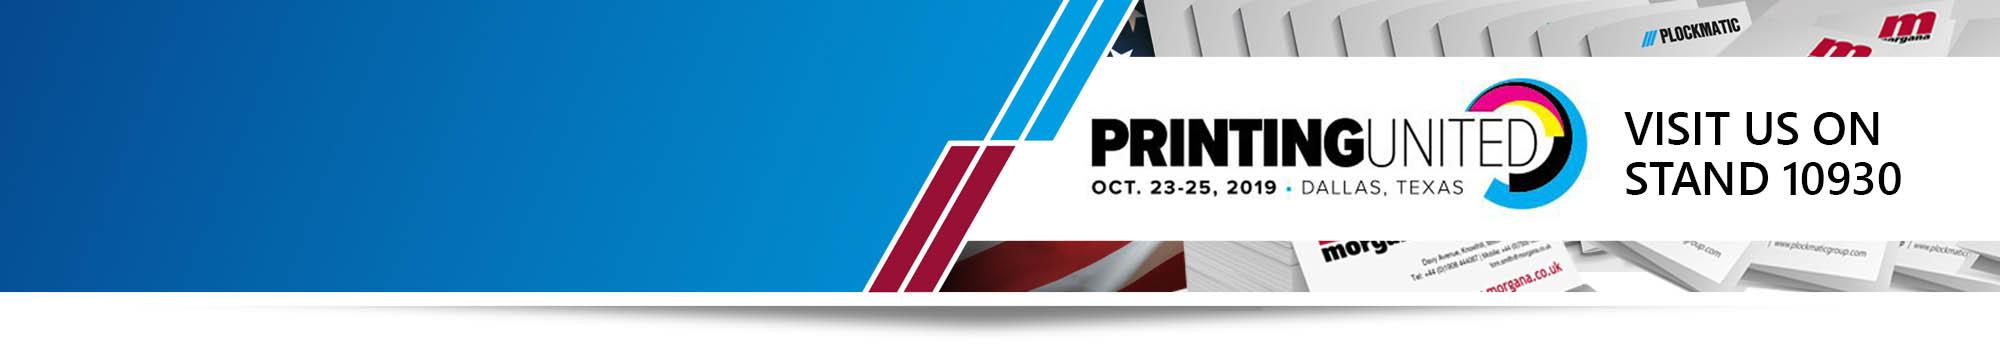 Offline-home-USA-printing-united